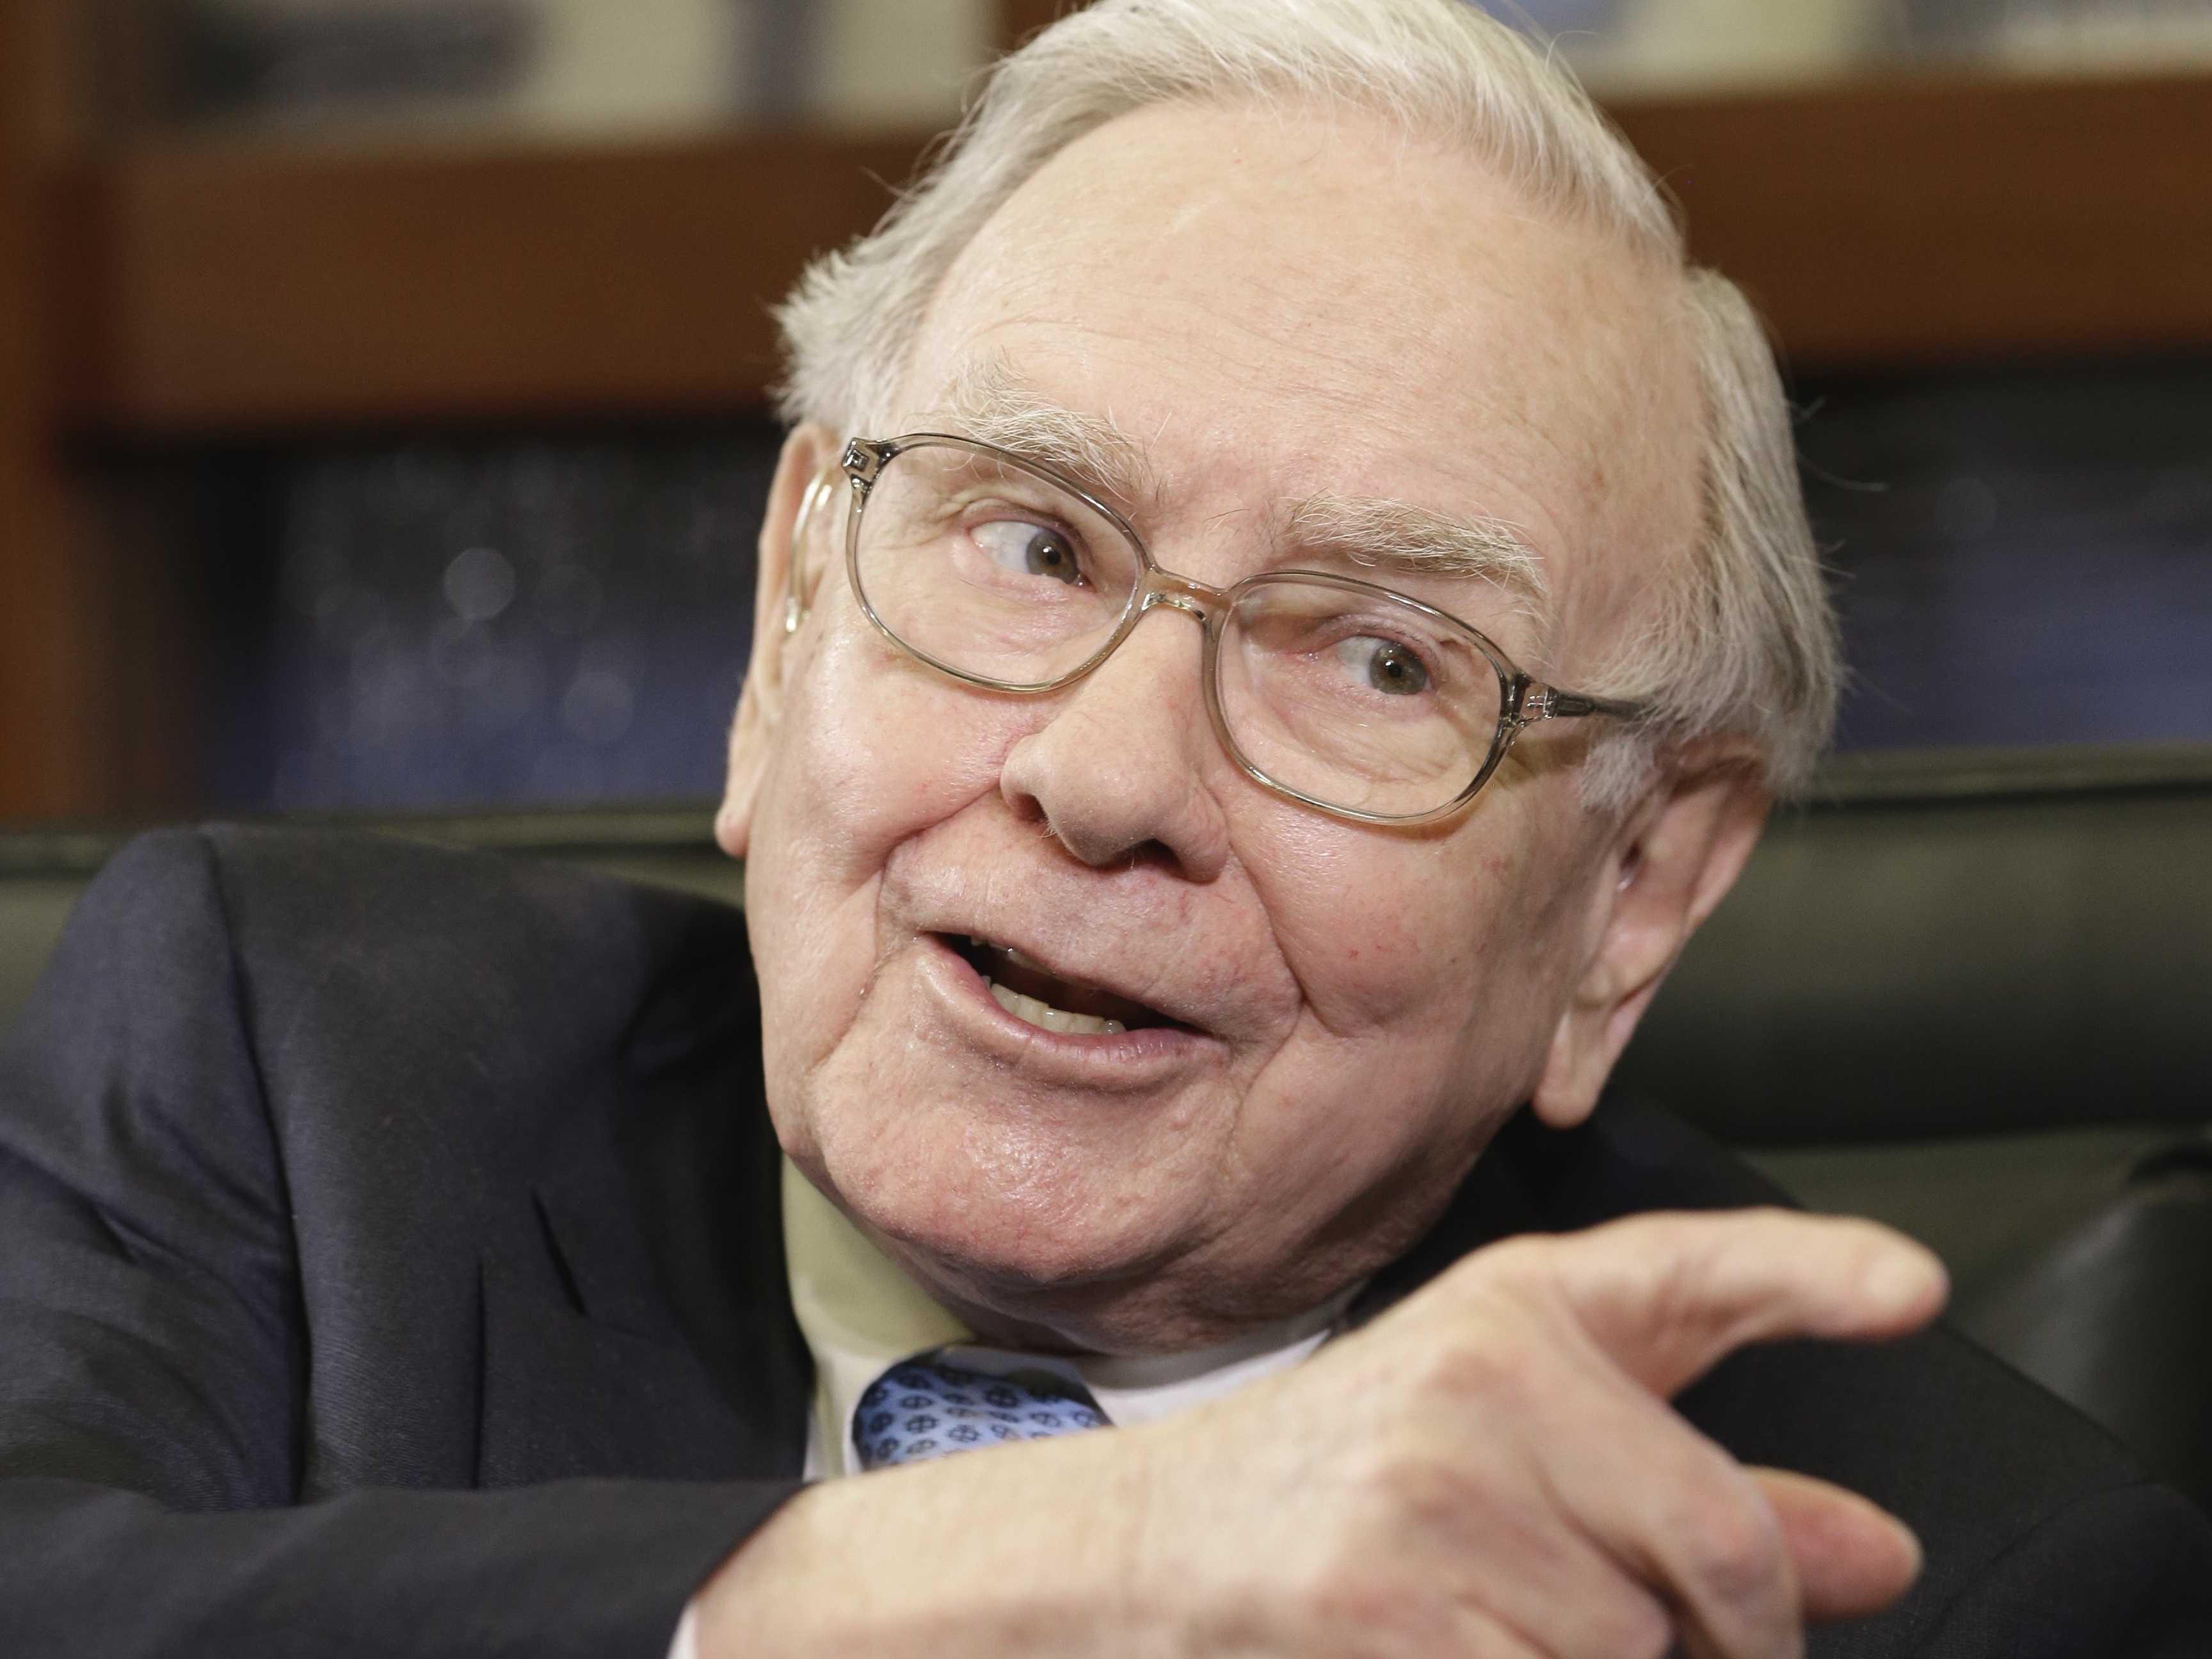 Libros de negocios favoritos de Warren Buffett - Business Insider